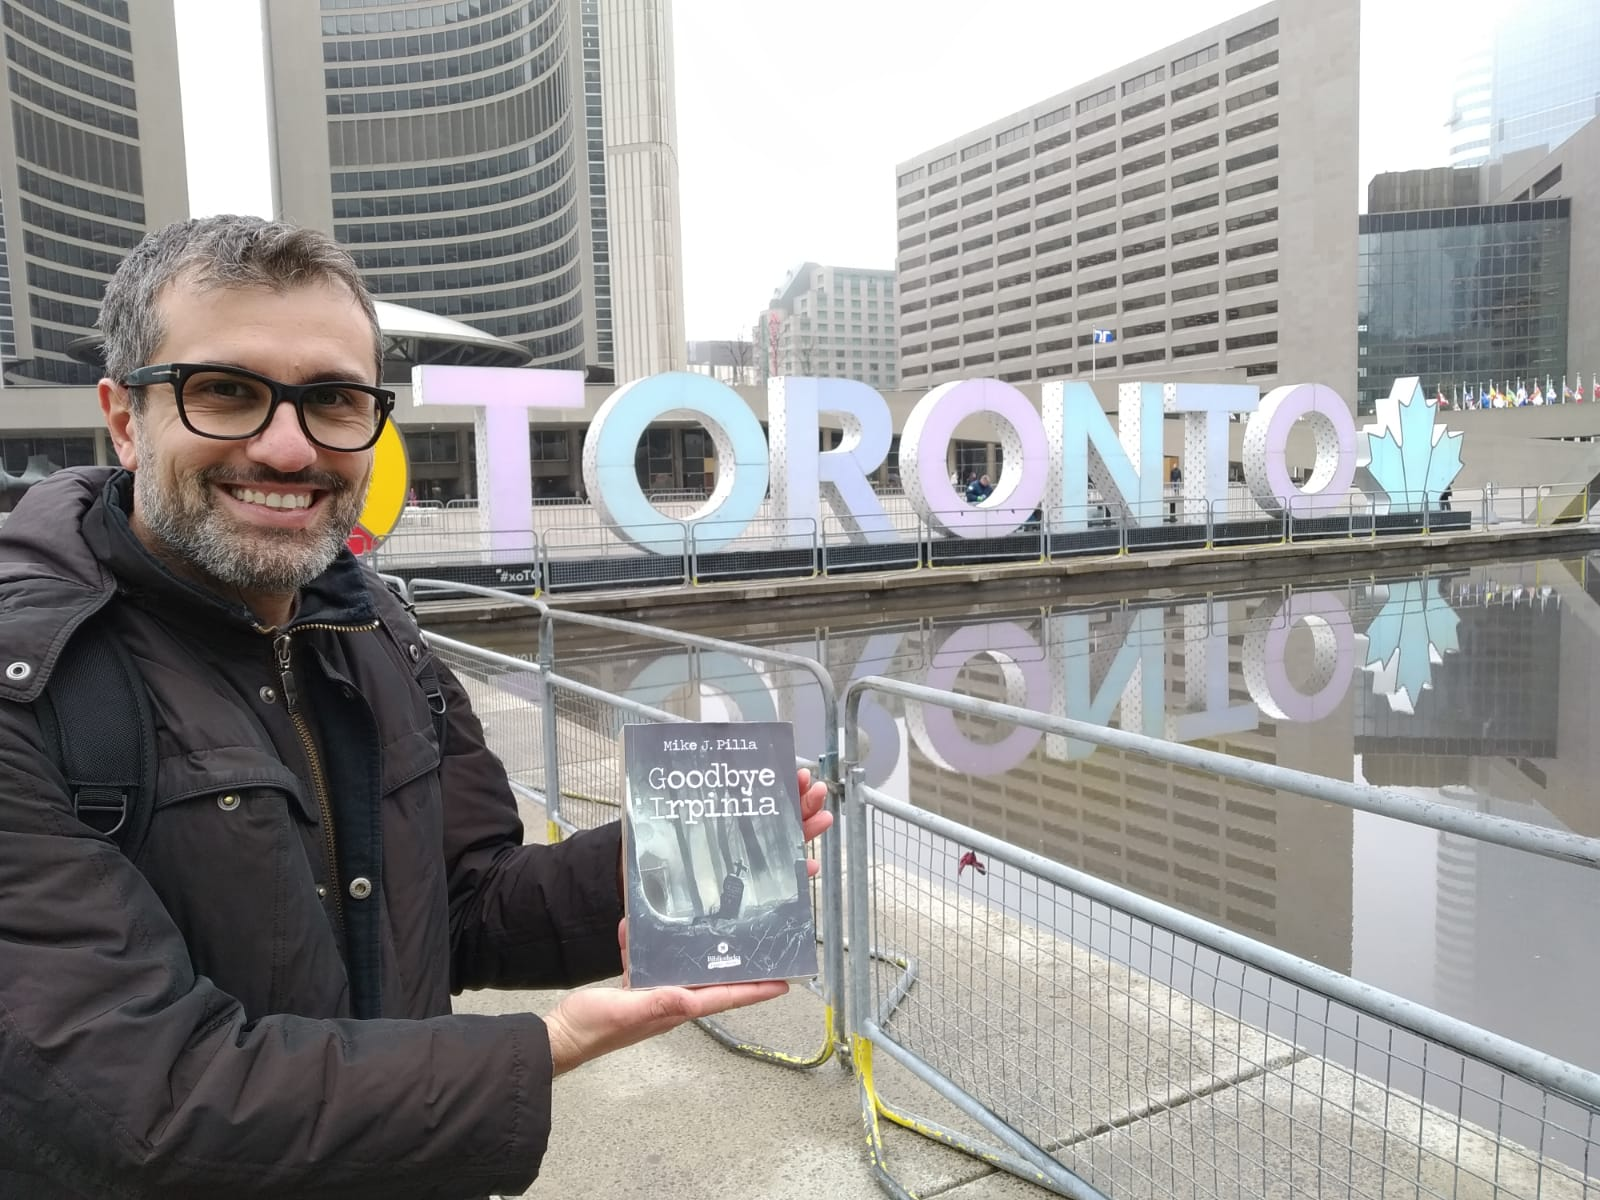 Mike J. Pilla a Toronto per presentare Goodbye Irpinia